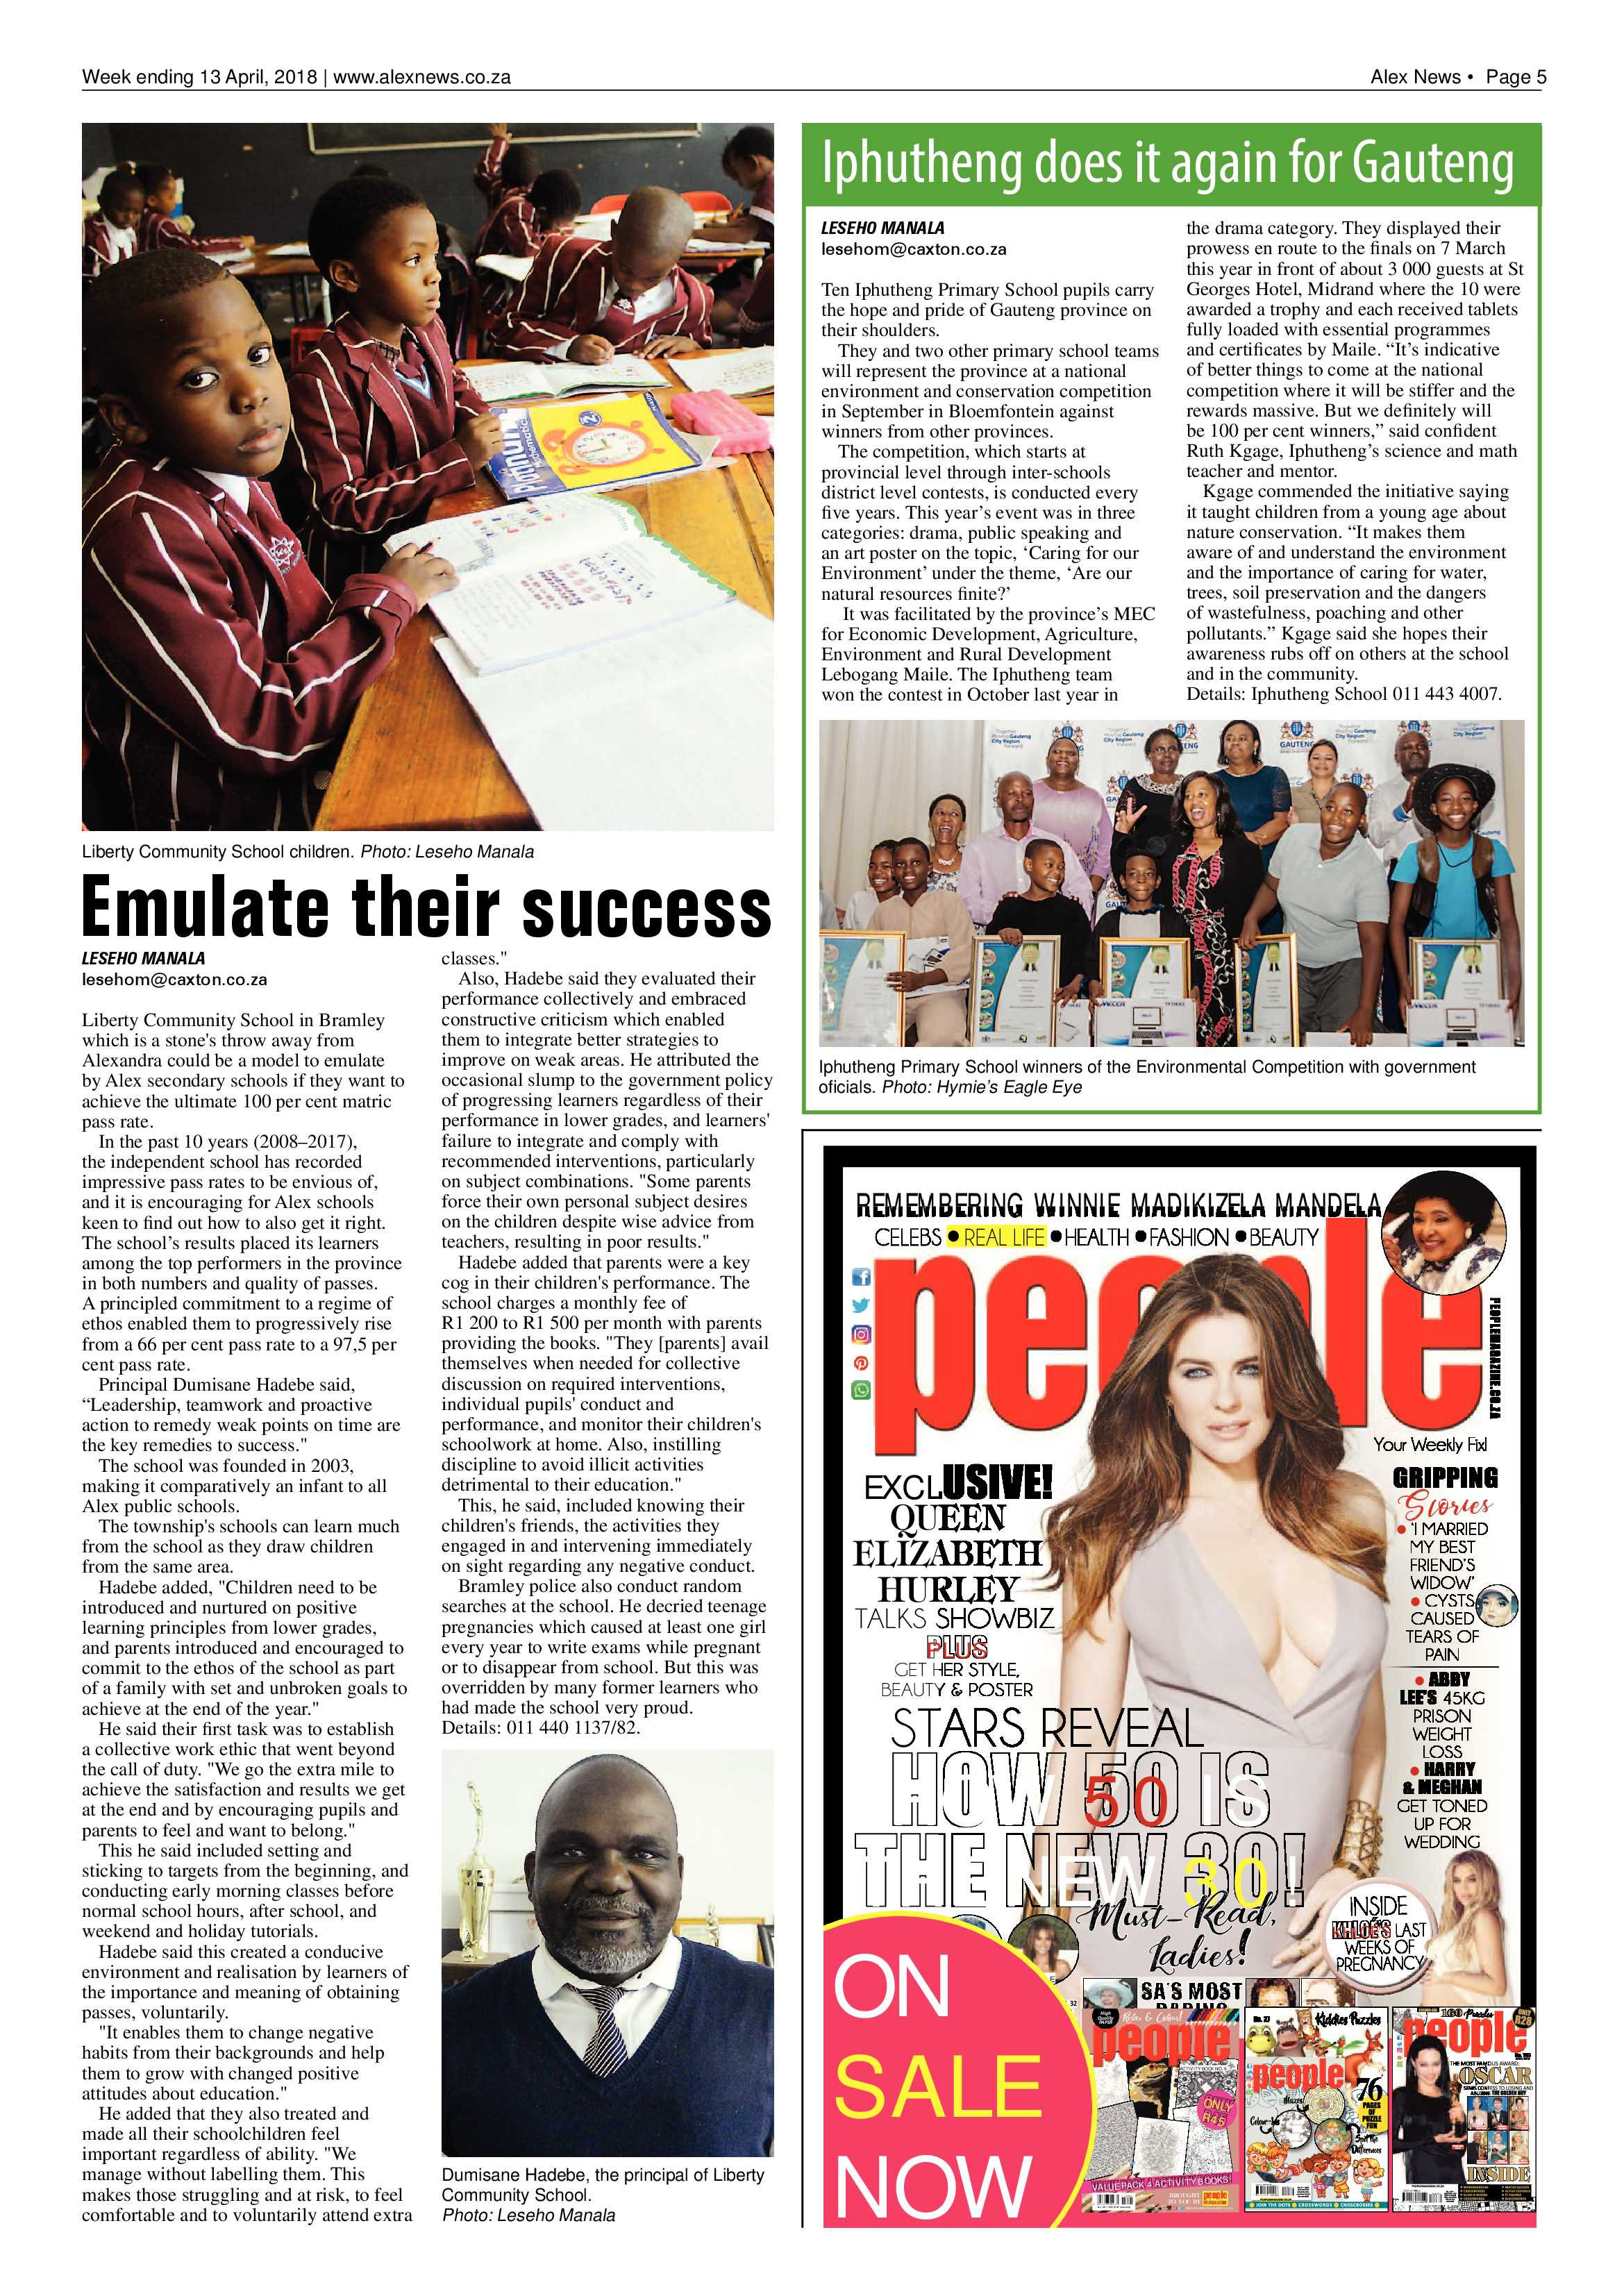 alex-news-13-april-2018-epapers-page-5